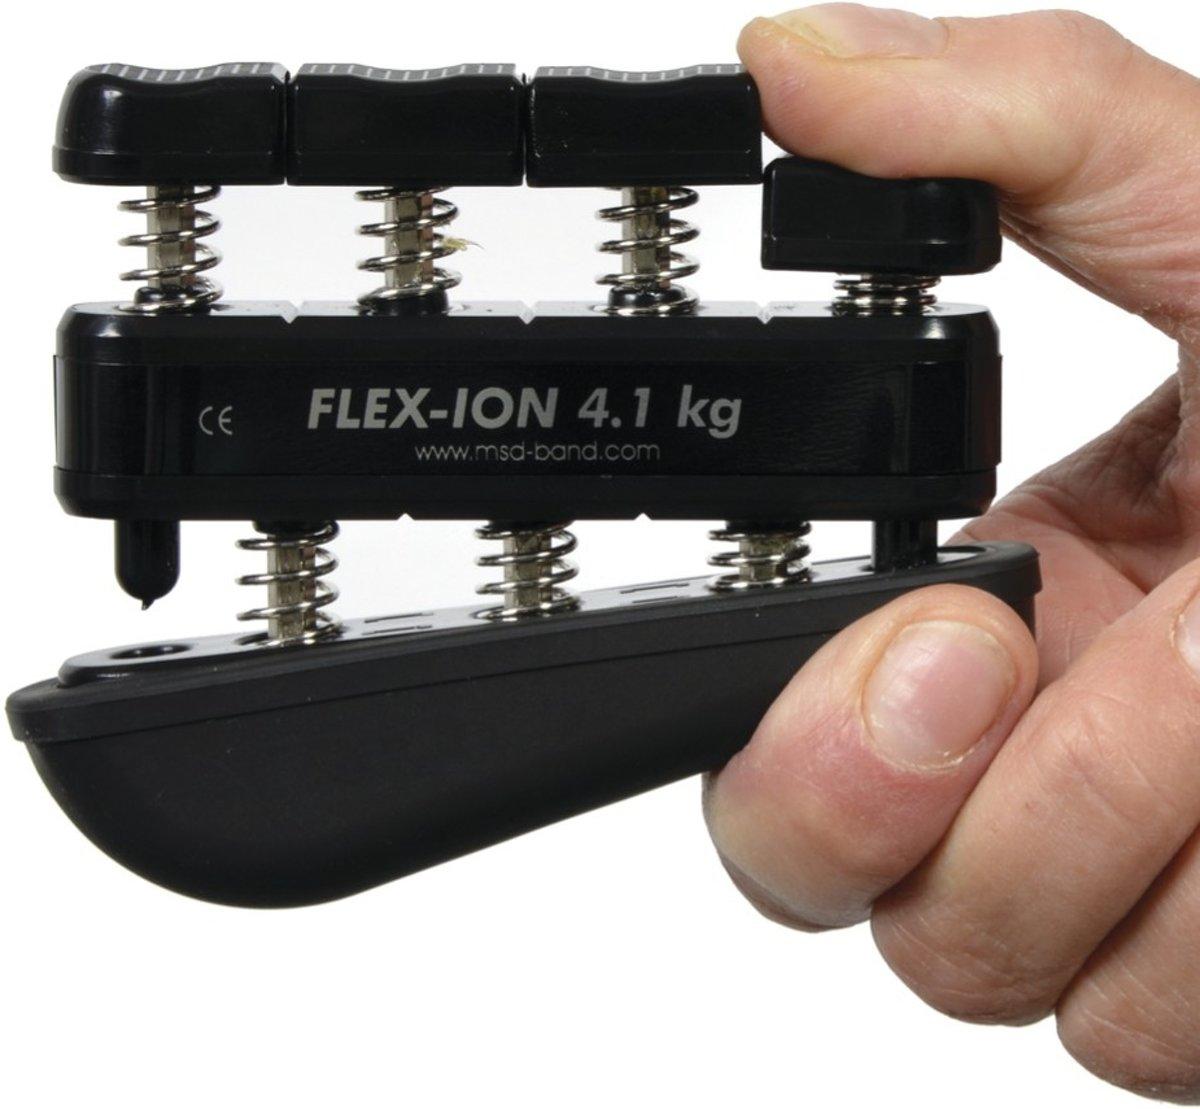 Vingertrainer Flex-ion zwart 4,1 kg / 14,1 kg kopen